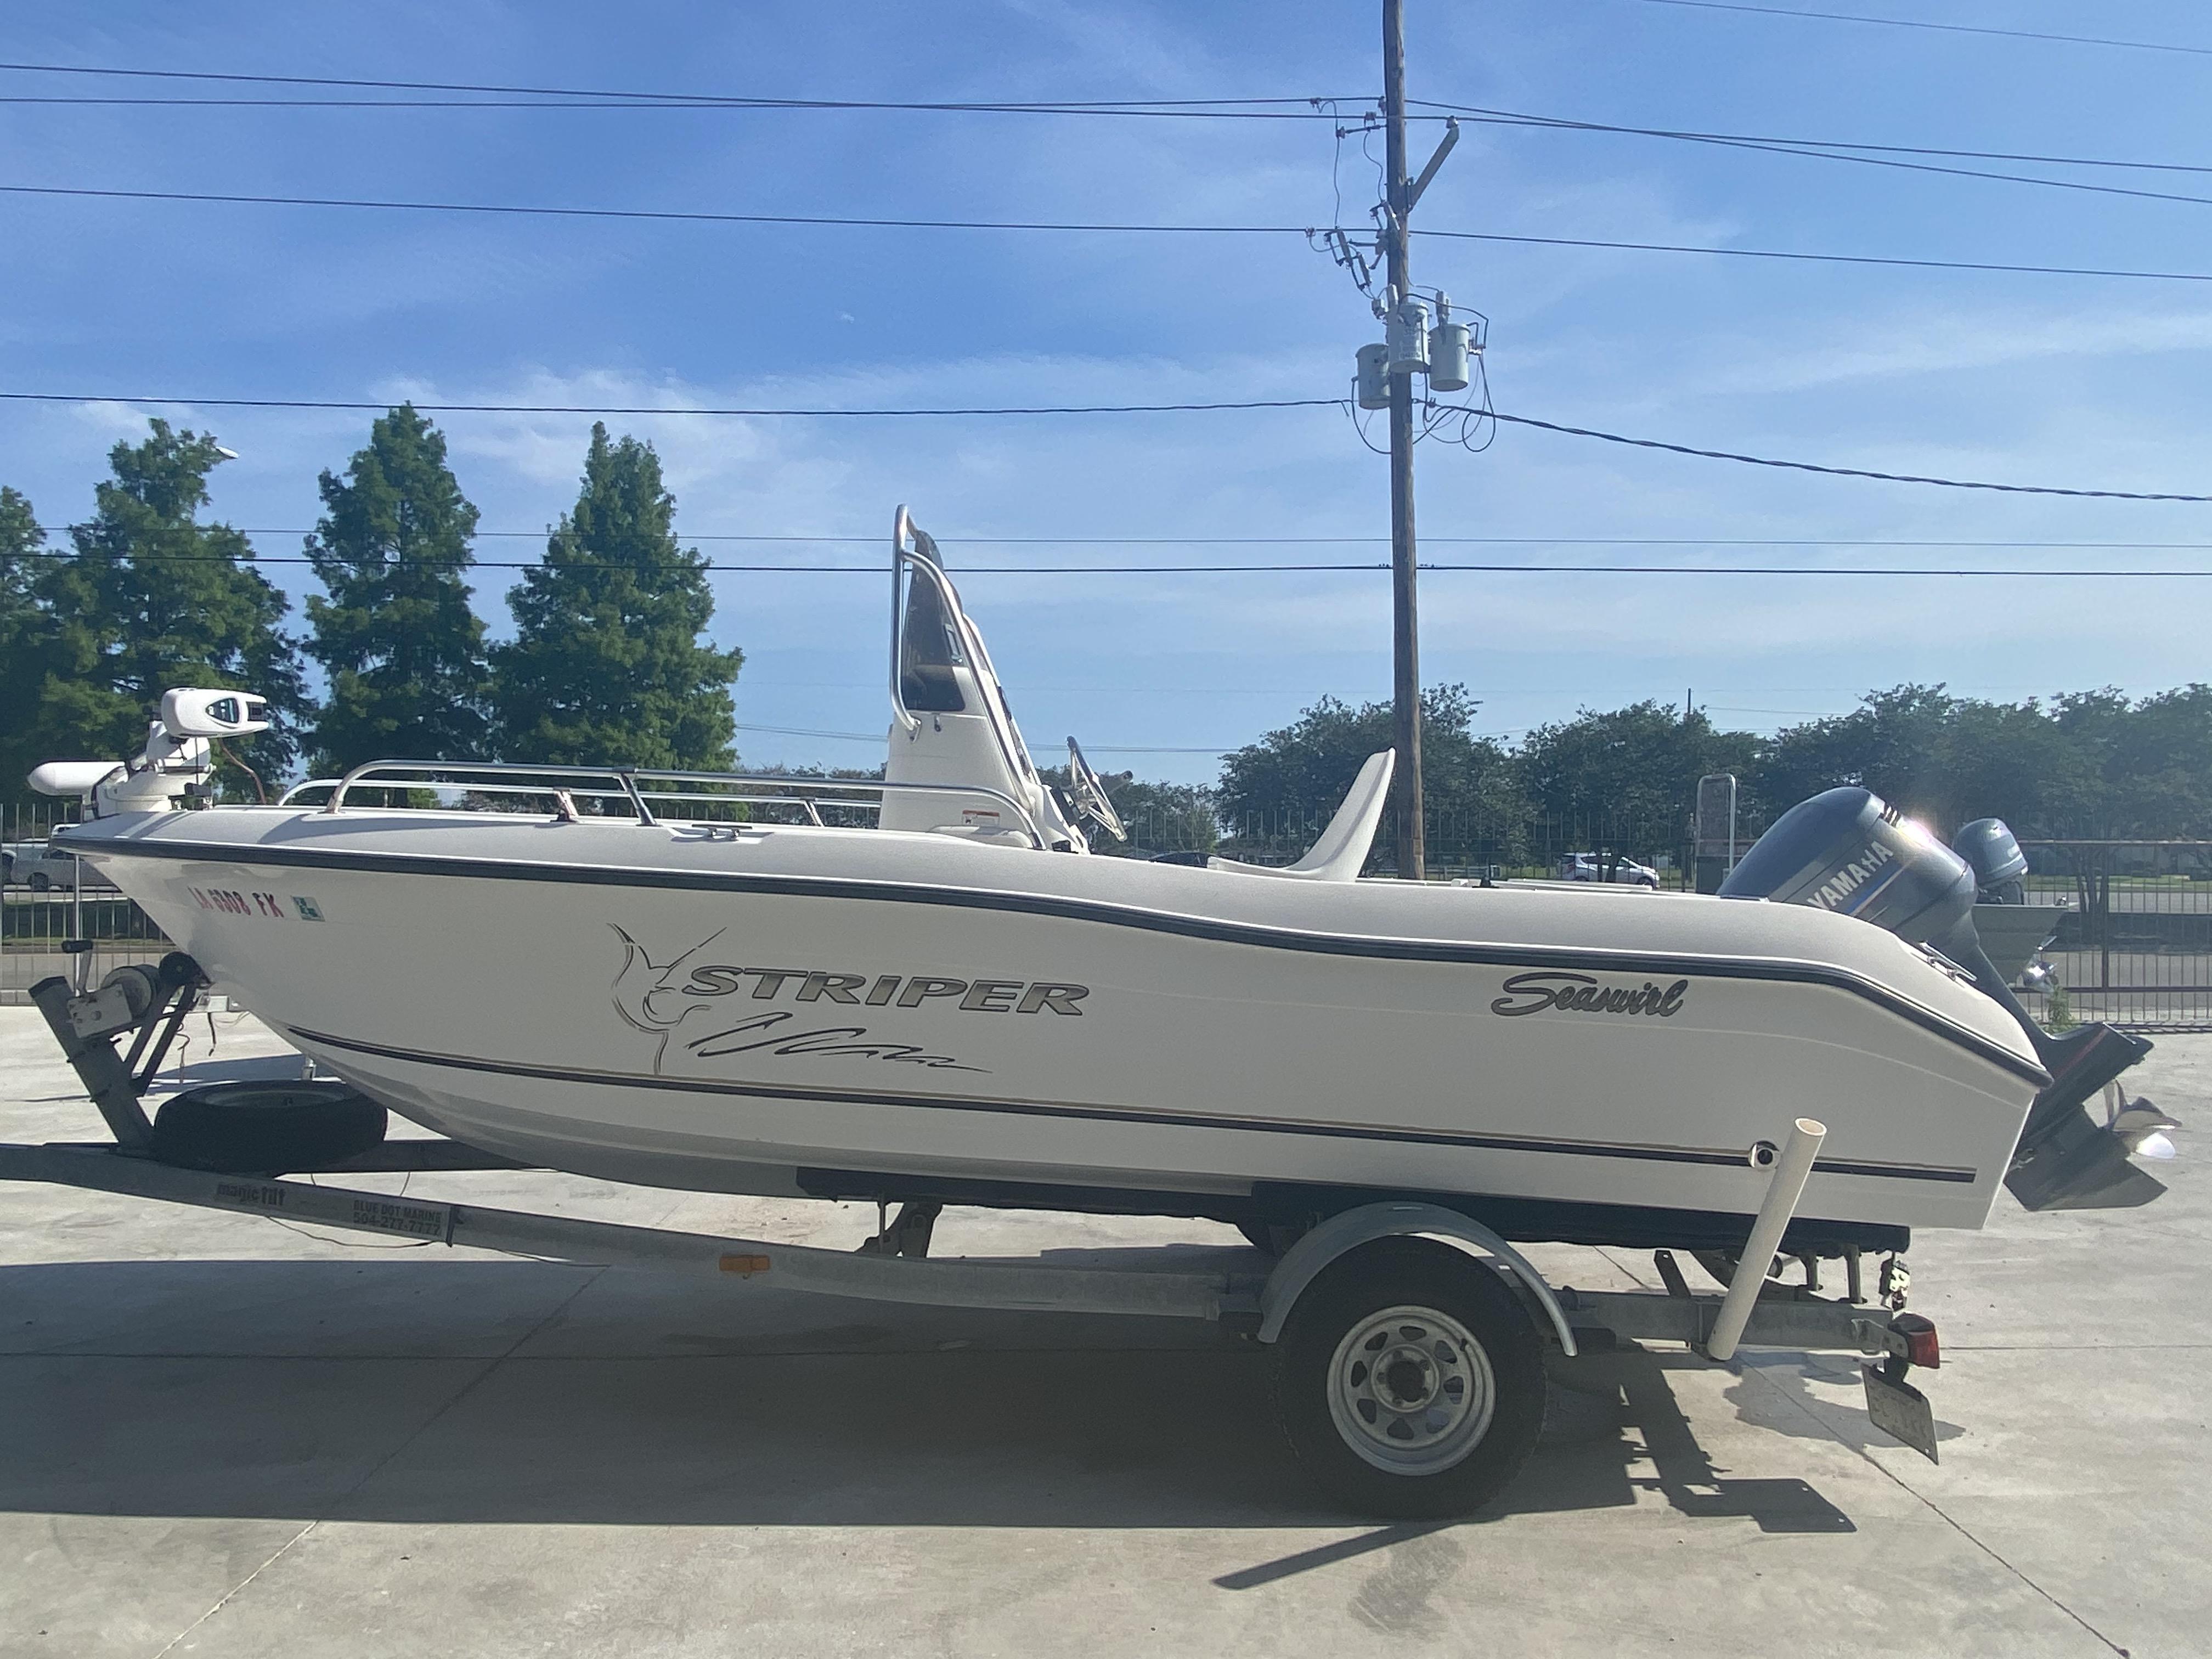 2004 Seaswirl boat for sale, model of the boat is 186 Striper & Image # 4 of 12